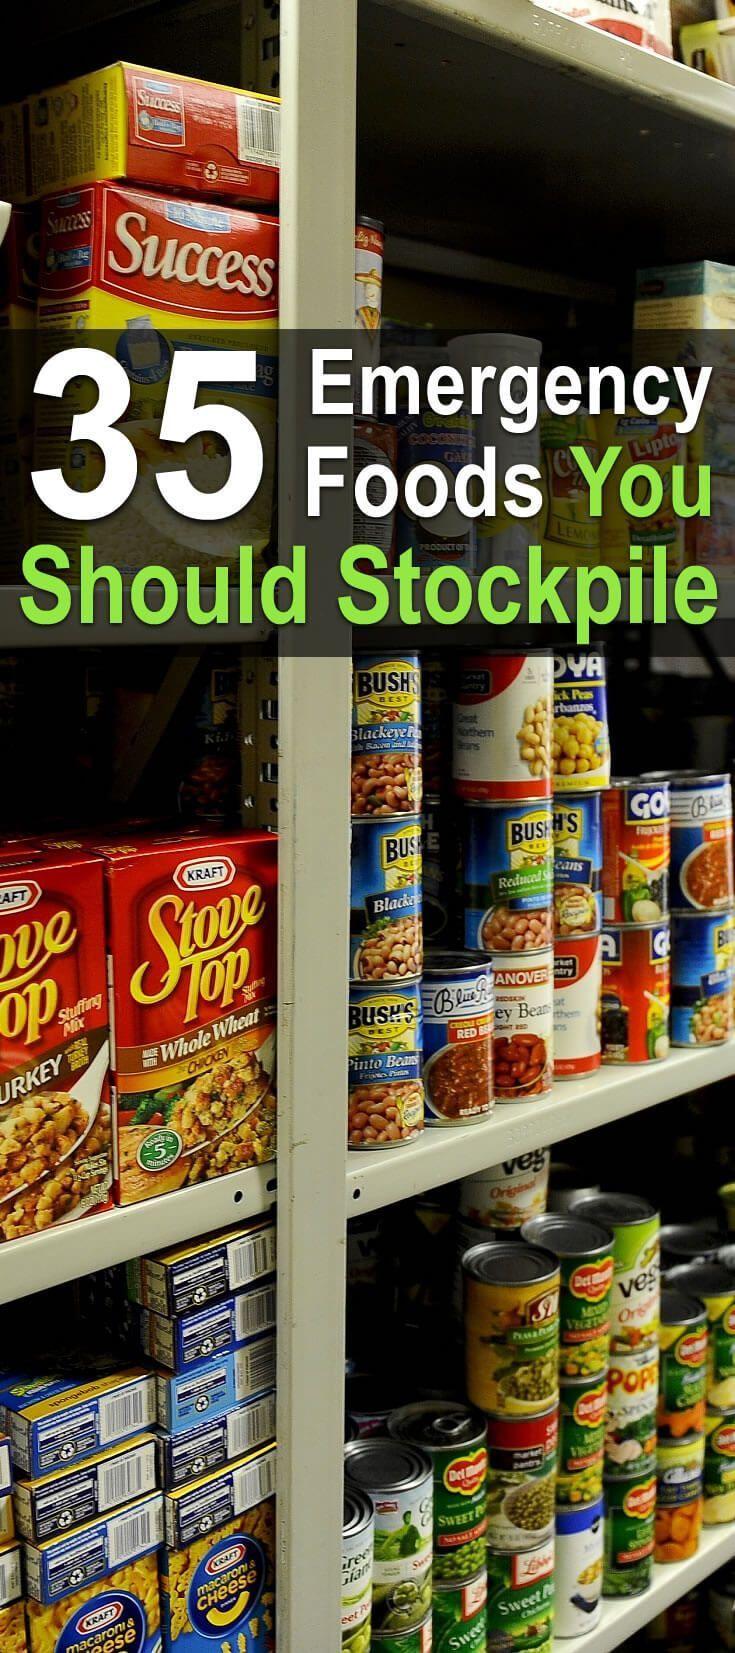 Food storage & 35 Emergency Foods You Should Stockpile | Emergency food Survival ...